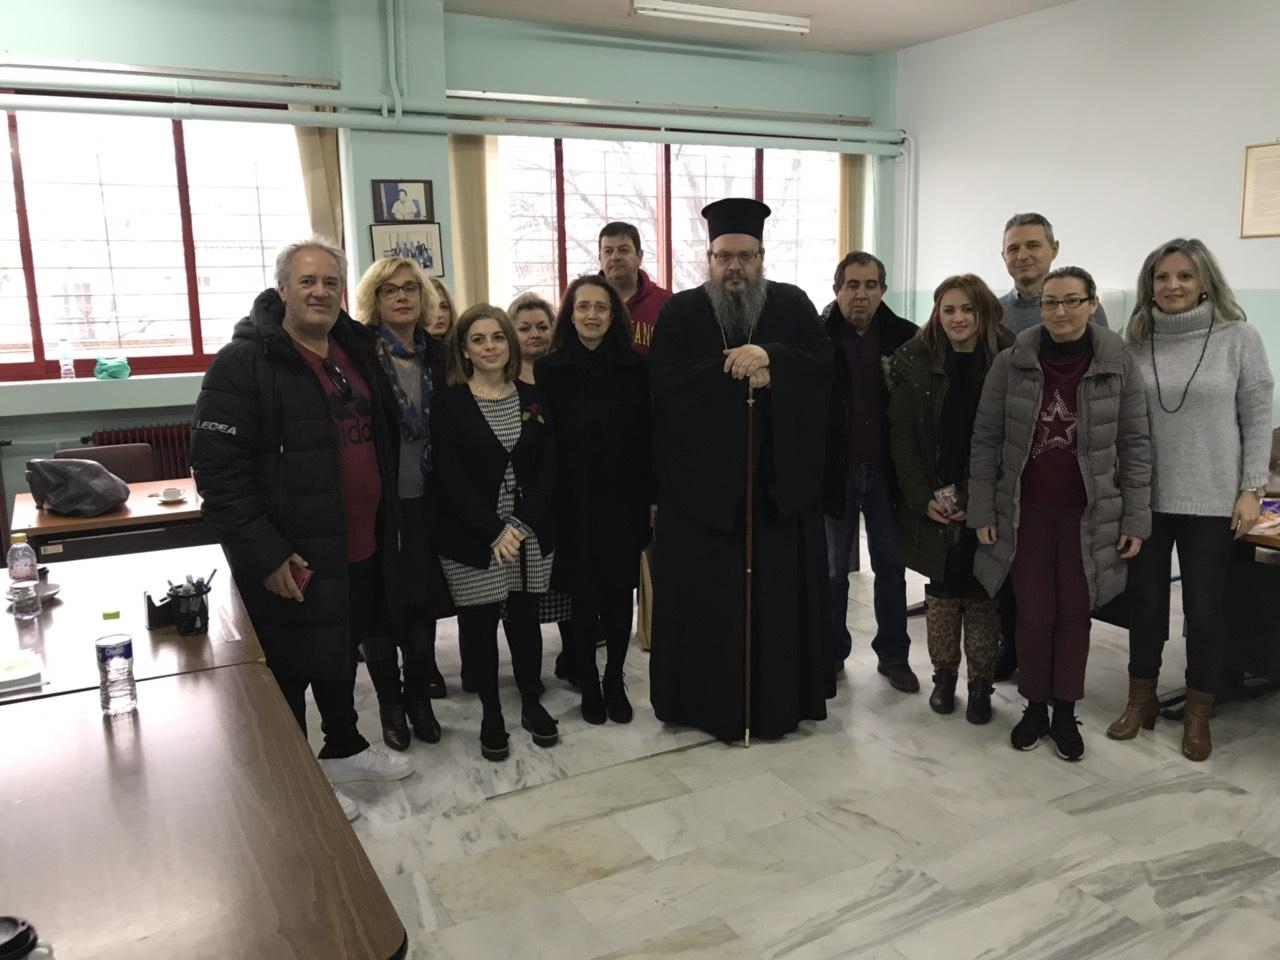 sxolia tirnavos 10 - Σε σχολεία του Τυρνάβου ο Σεβασμιώτατος (φωτ.)